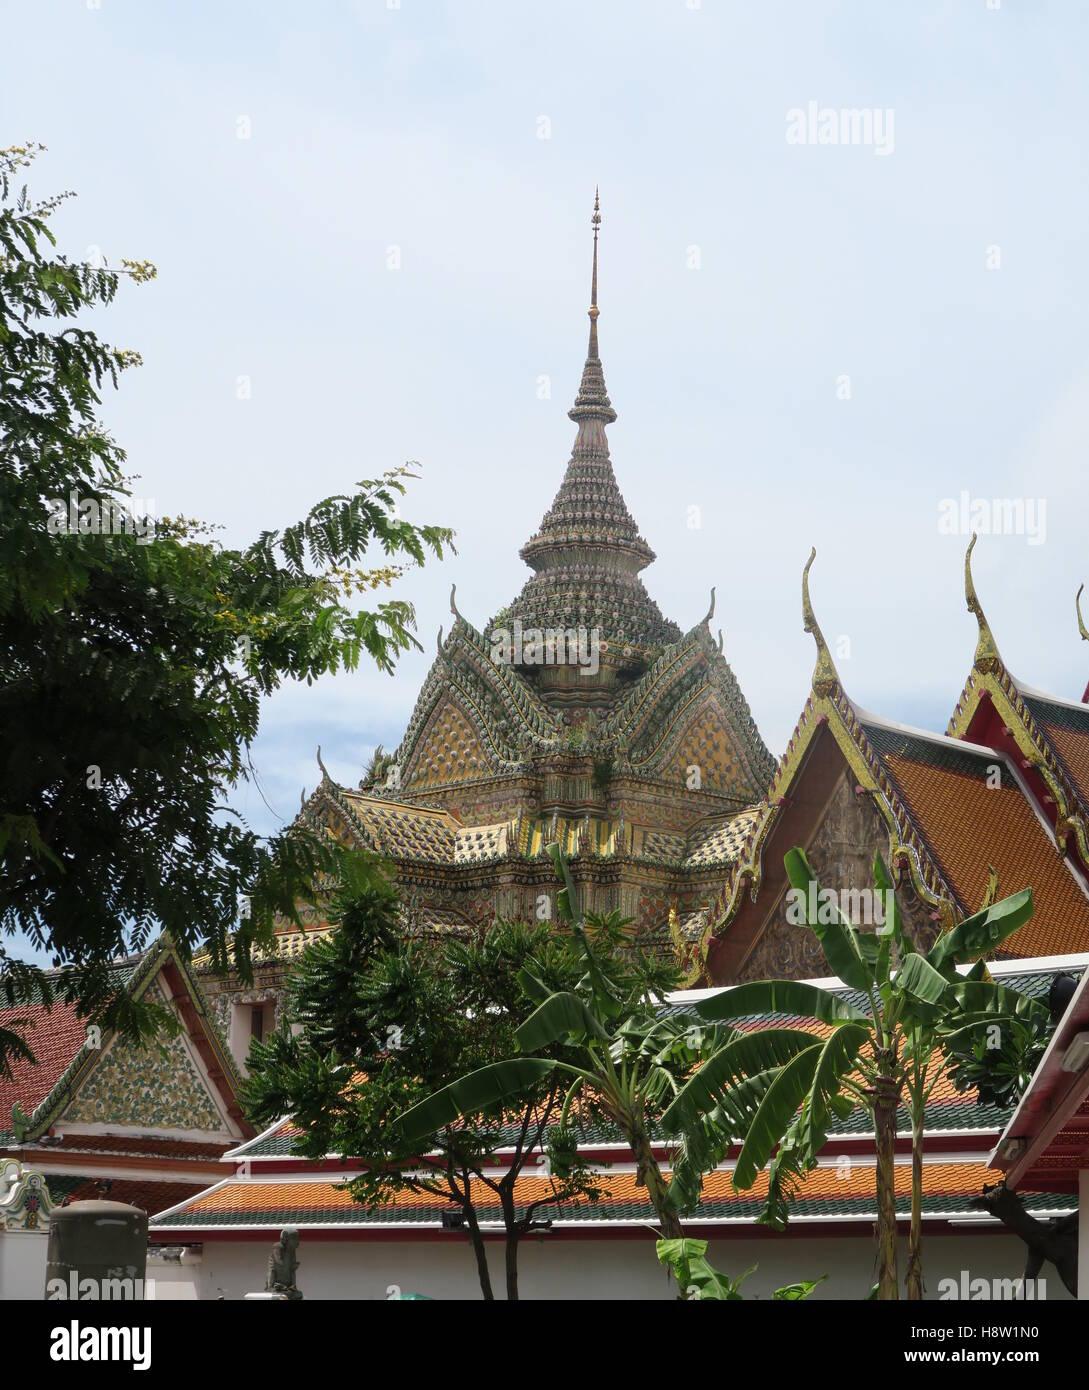 Wat pho temple, Bangkok, Thailand - Stock Image